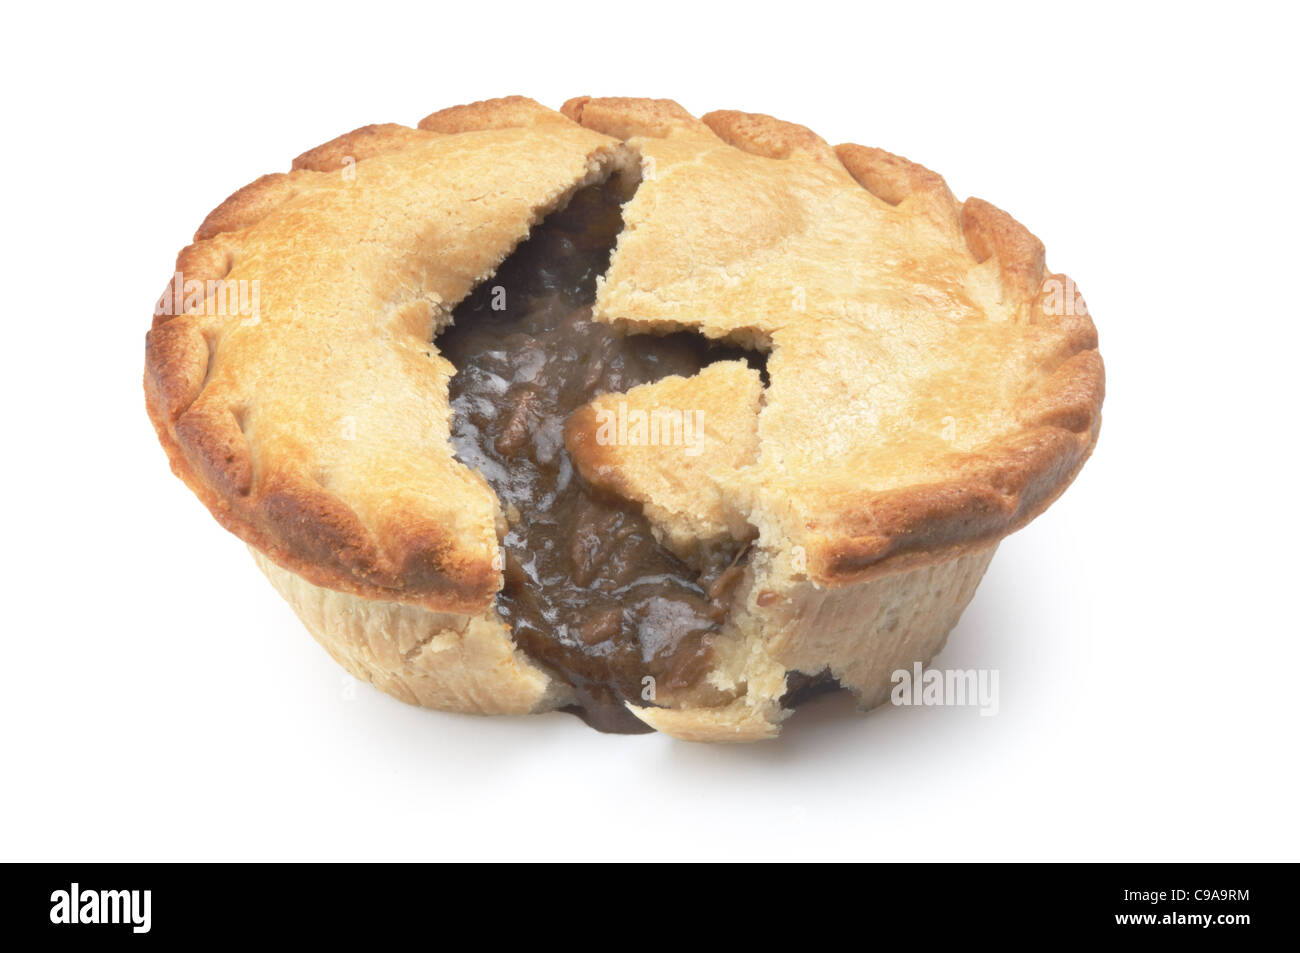 Pie - John Gollop - Stock Image